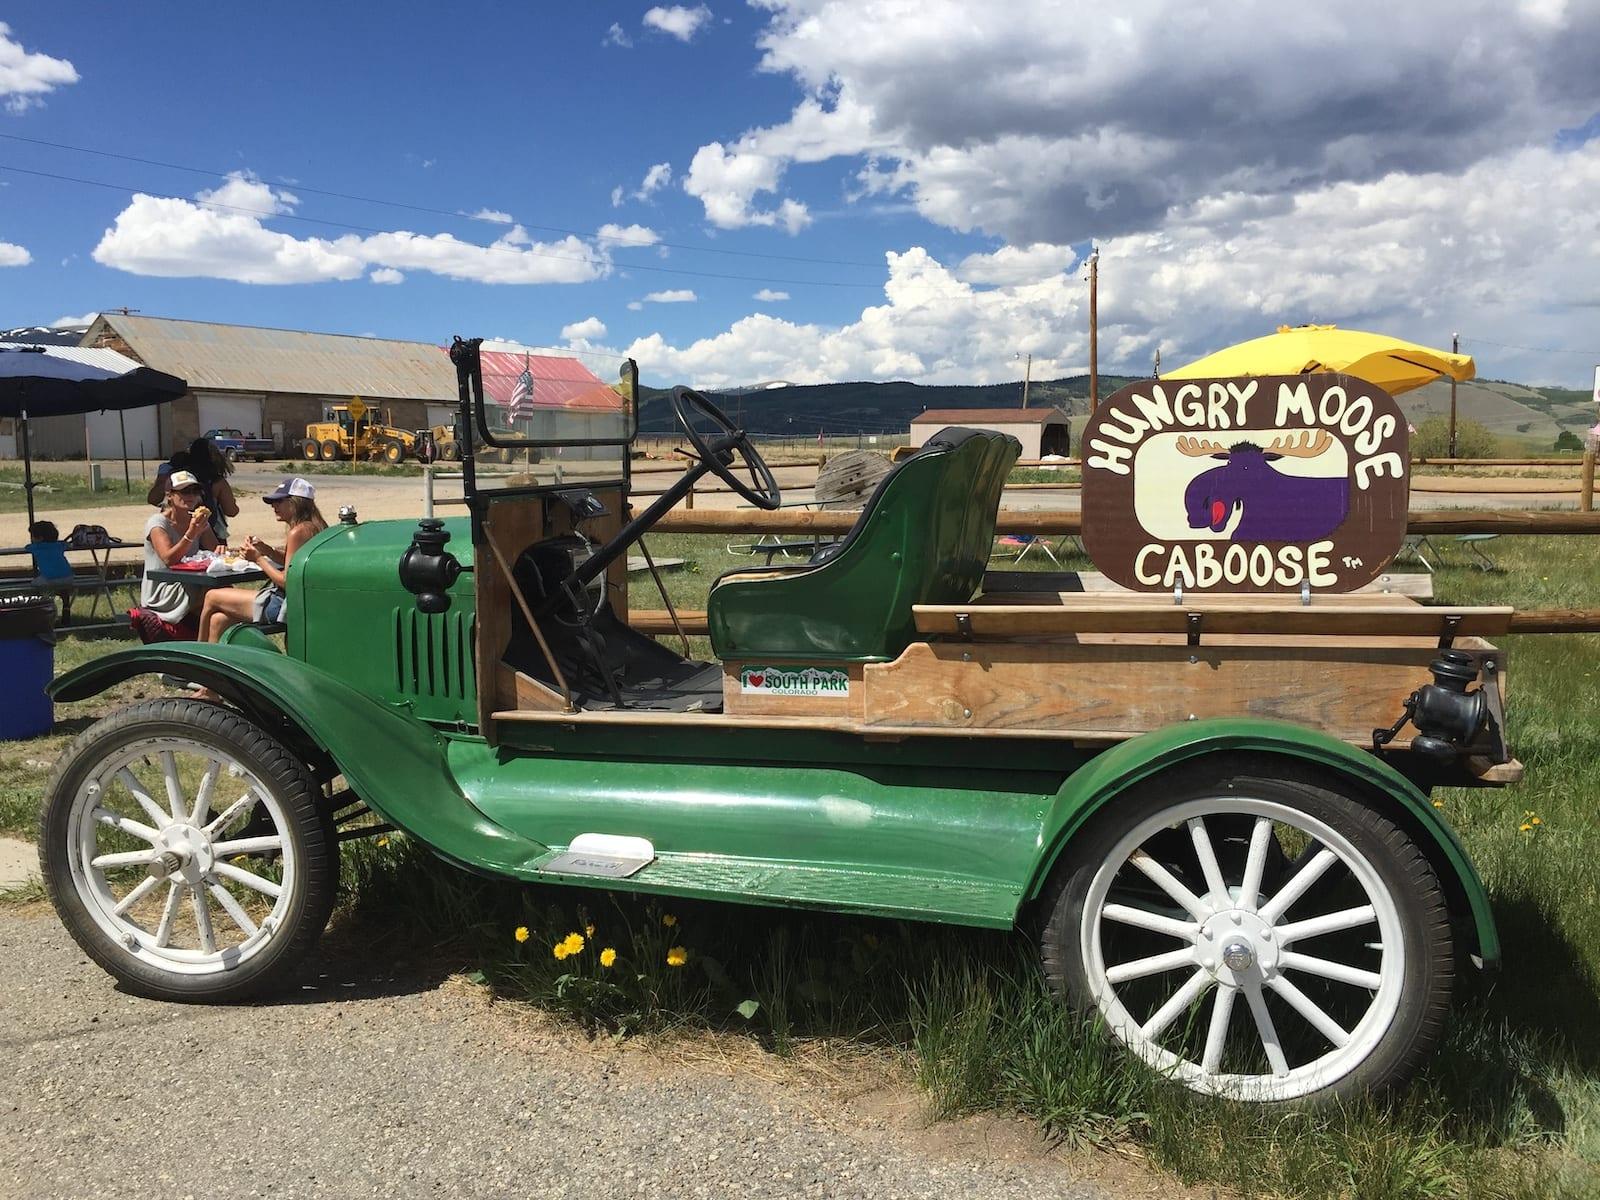 Jefferson Colorado Hungry Moose Caboose Old Car